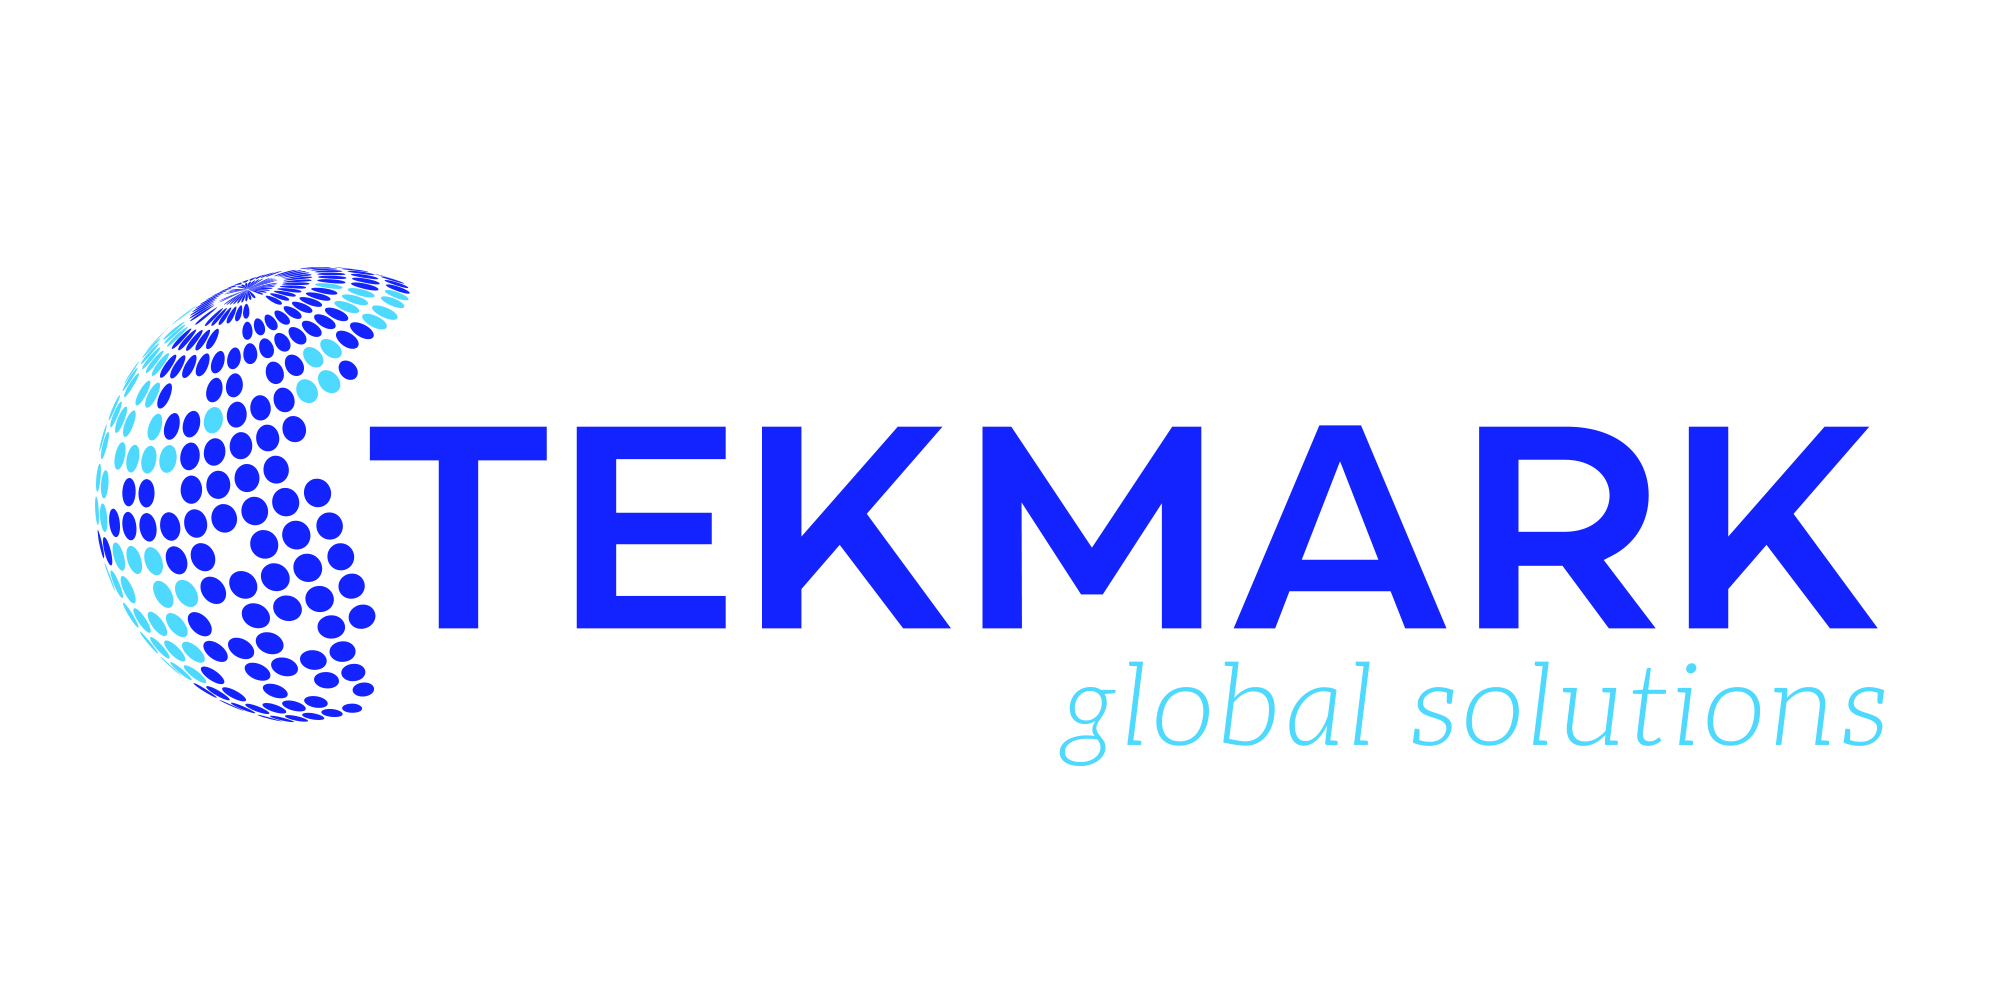 tekmark_logo_onwhite_CMYK.jpg